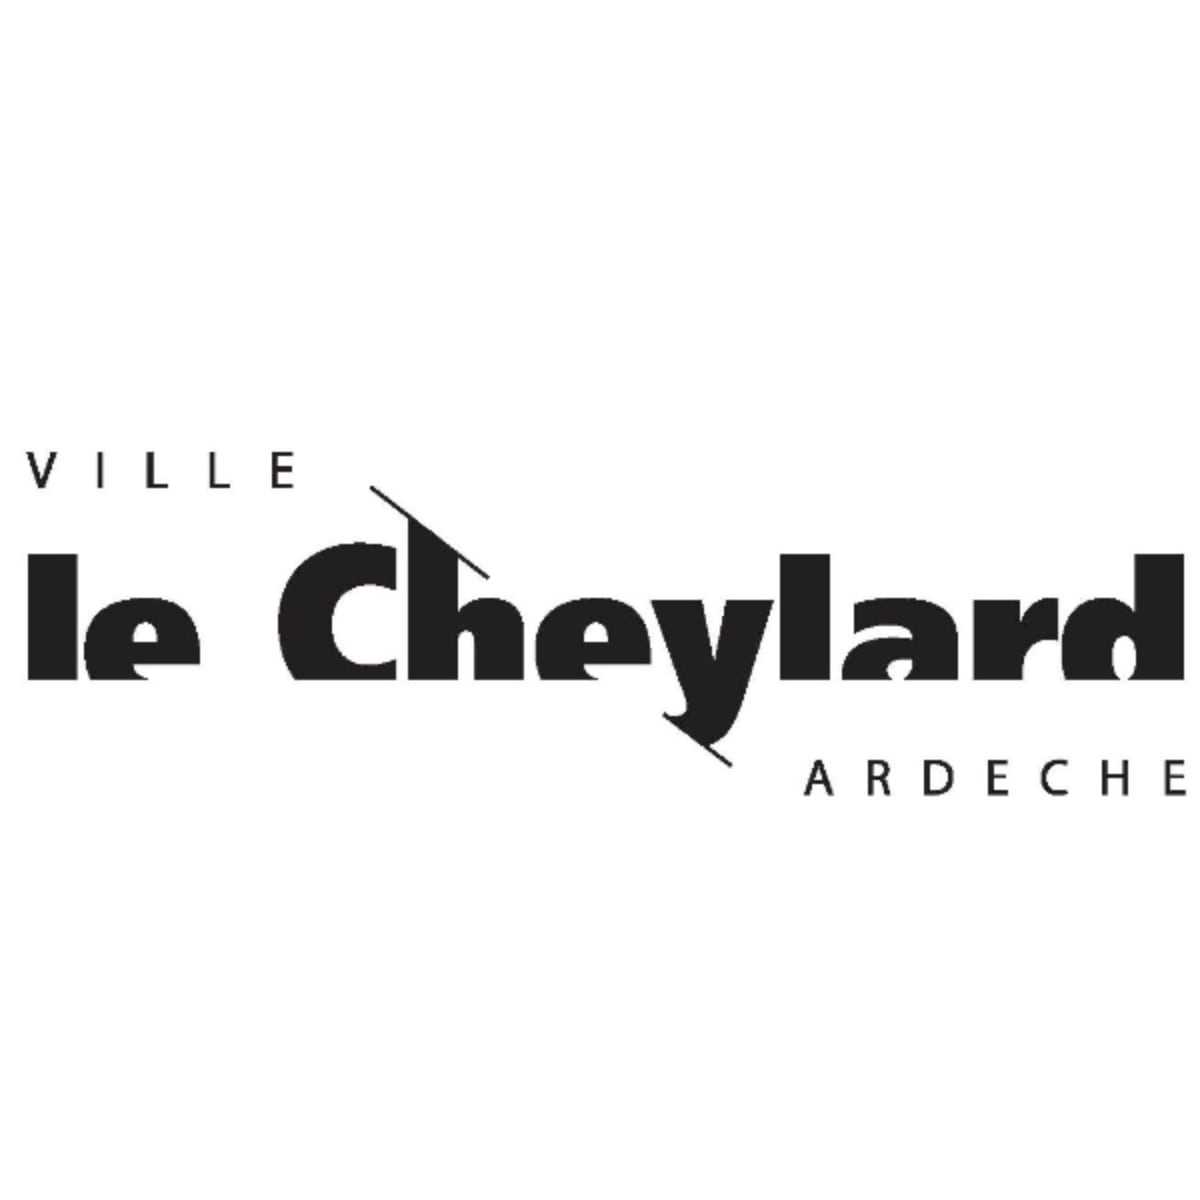 Le Cheylard